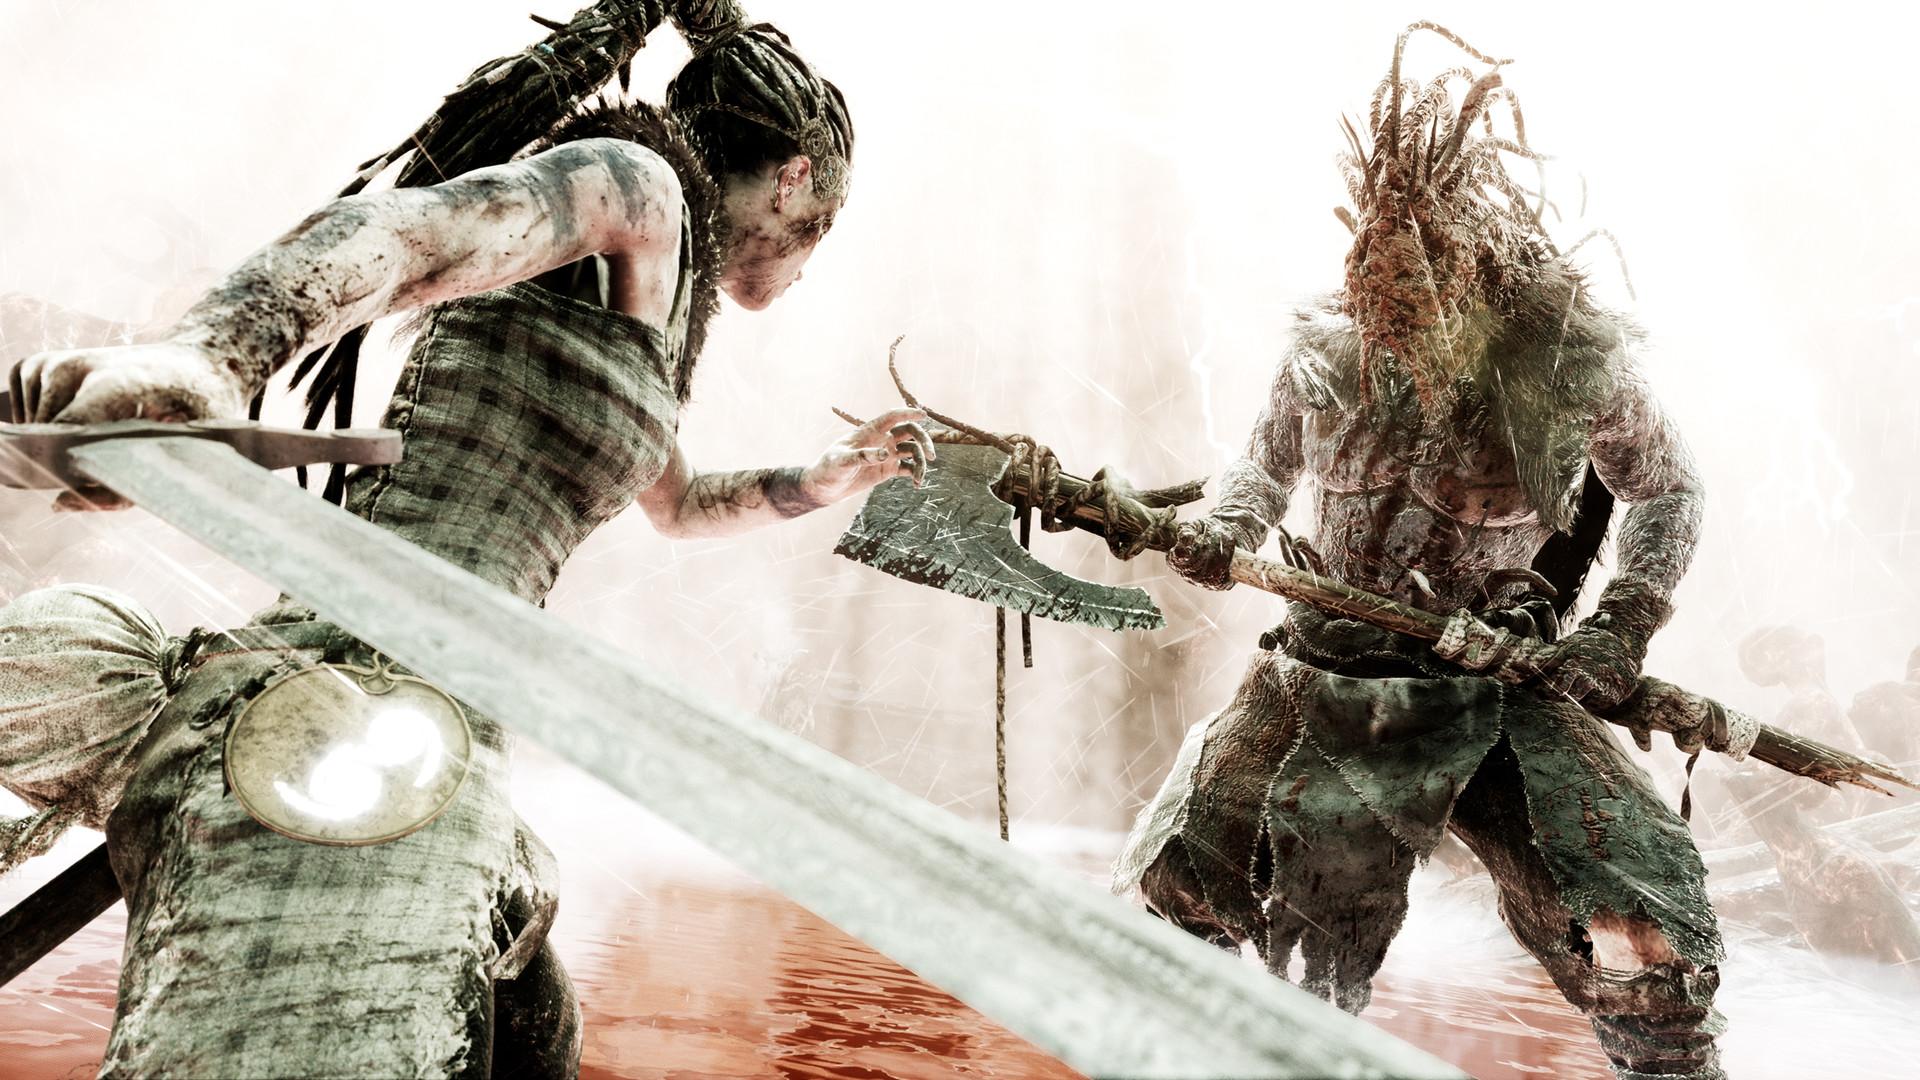 KHAiHOM.com - Hellblade: Senua's Sacrifice